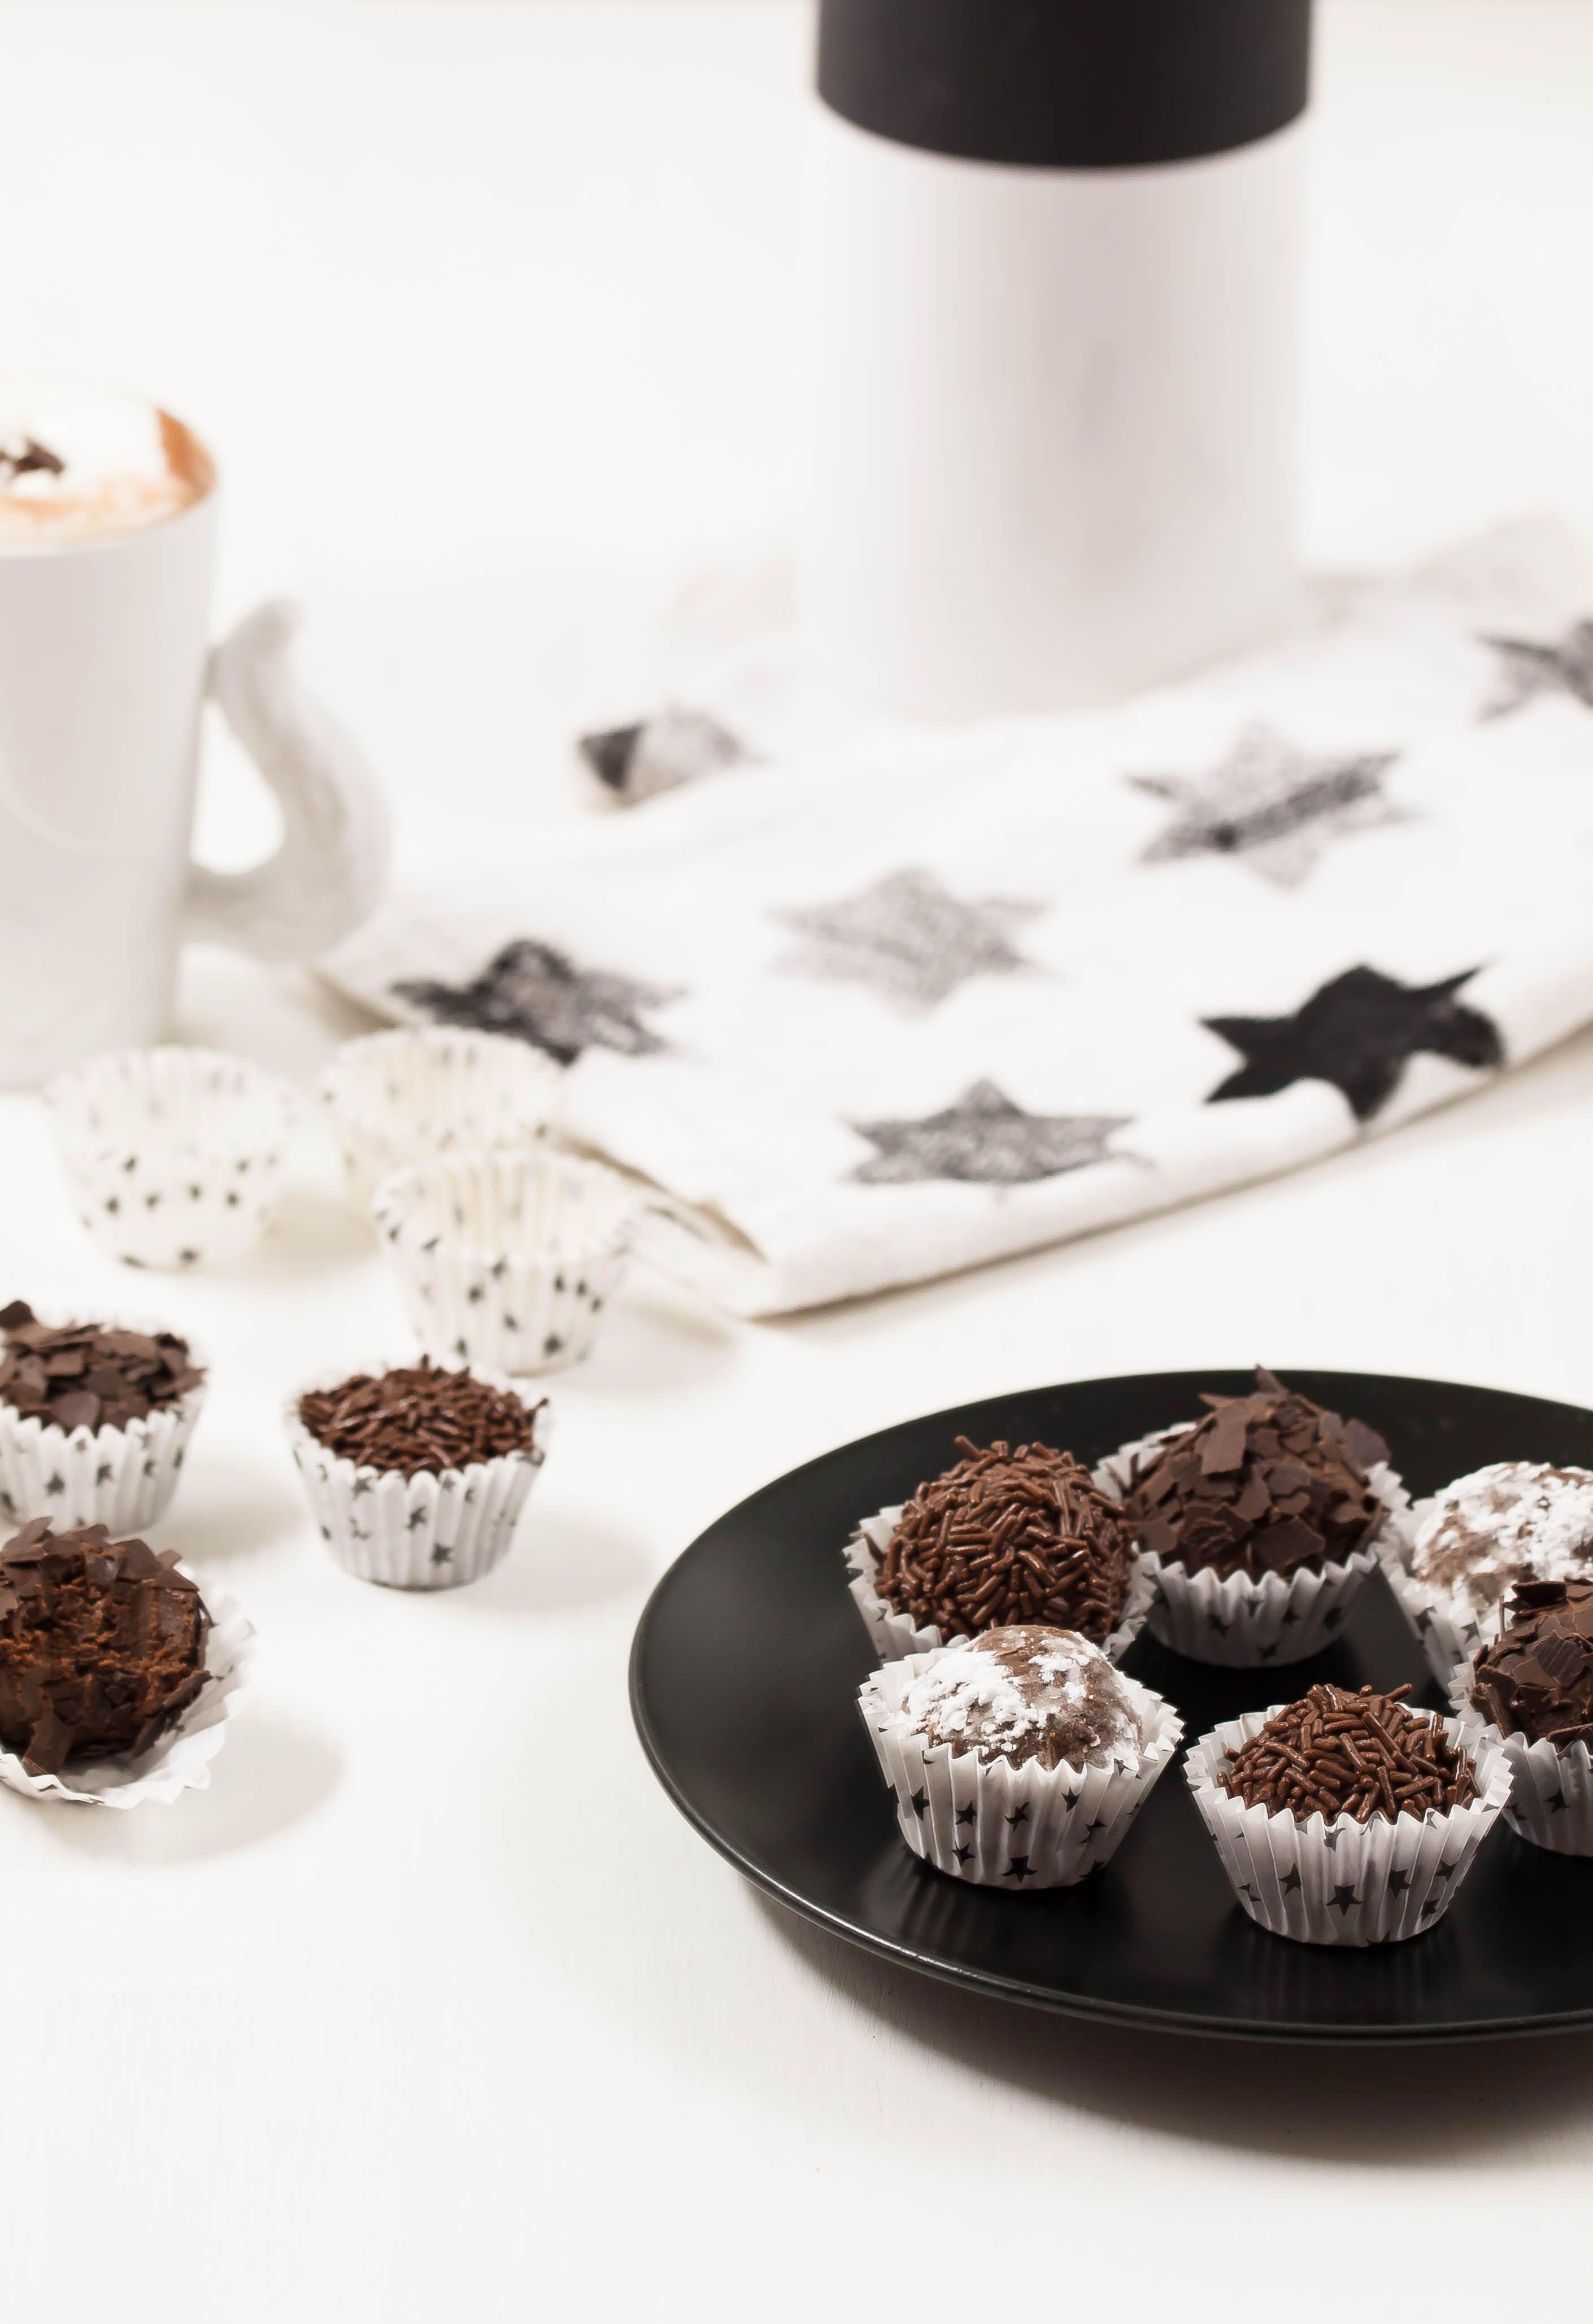 Selbstgemachte Rumkugeln mit heißer Schokolade | Kreavida - Süße ...